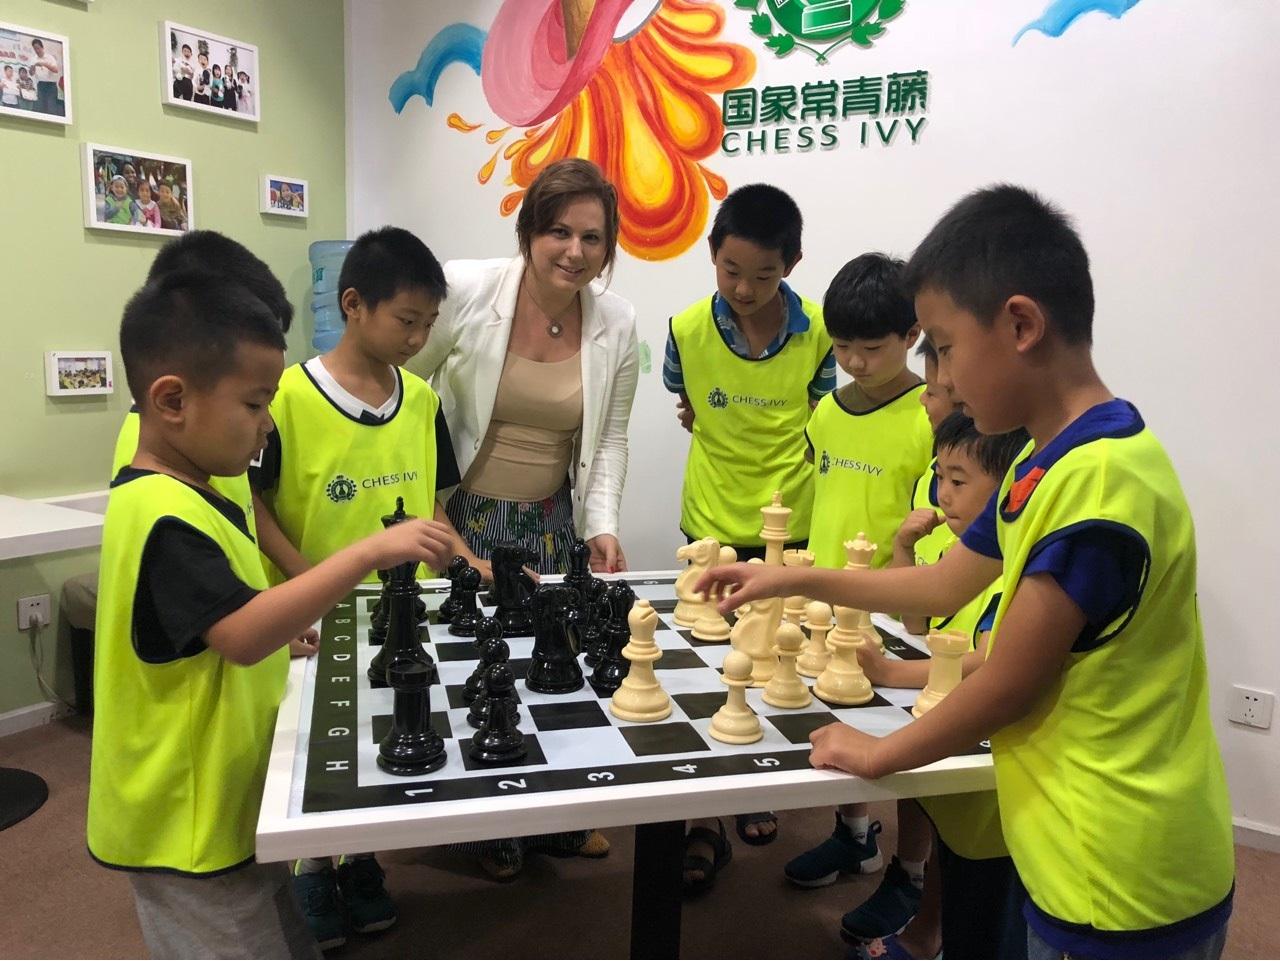 Ungarische Schachmeisterin erobert chinesische Schulen post's picture